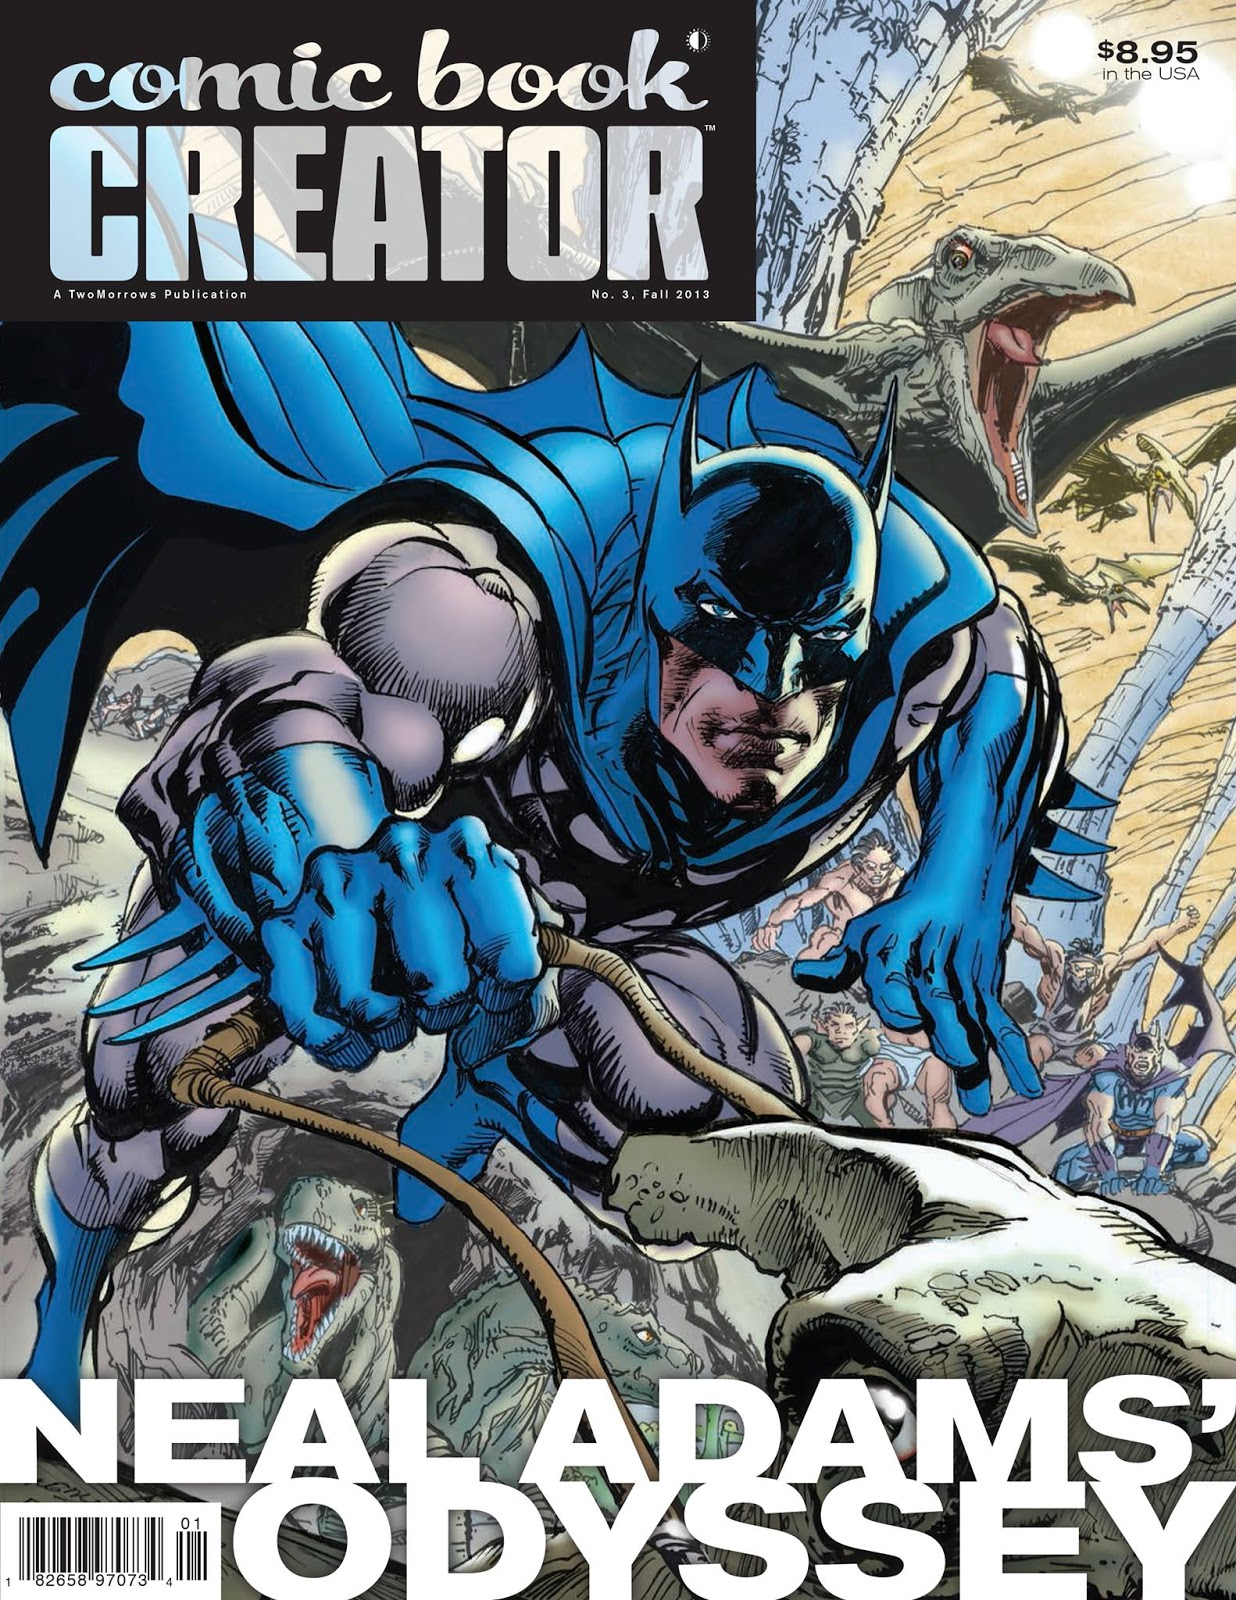 Booksteve S Library Comic Book Creator